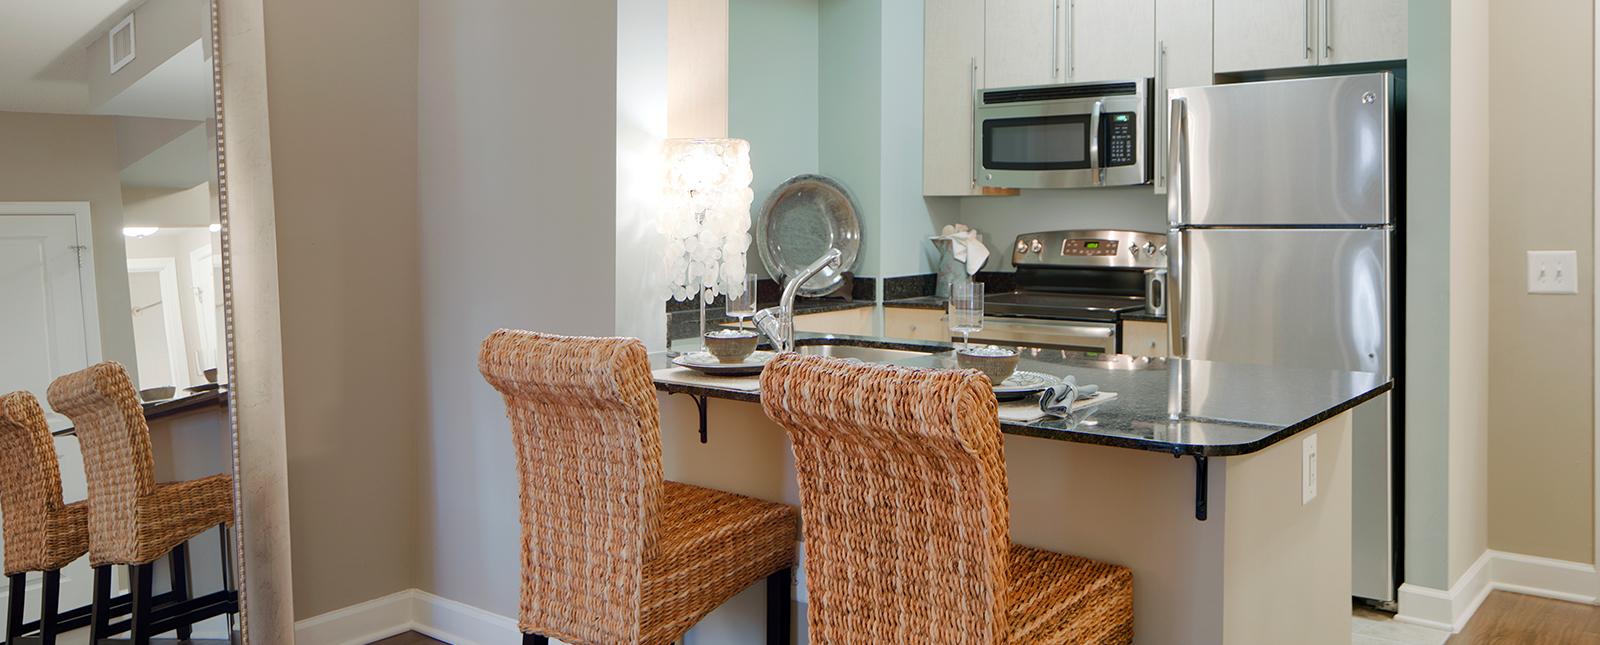 Kitchen at Spinnaker Bay Serviced Apartments